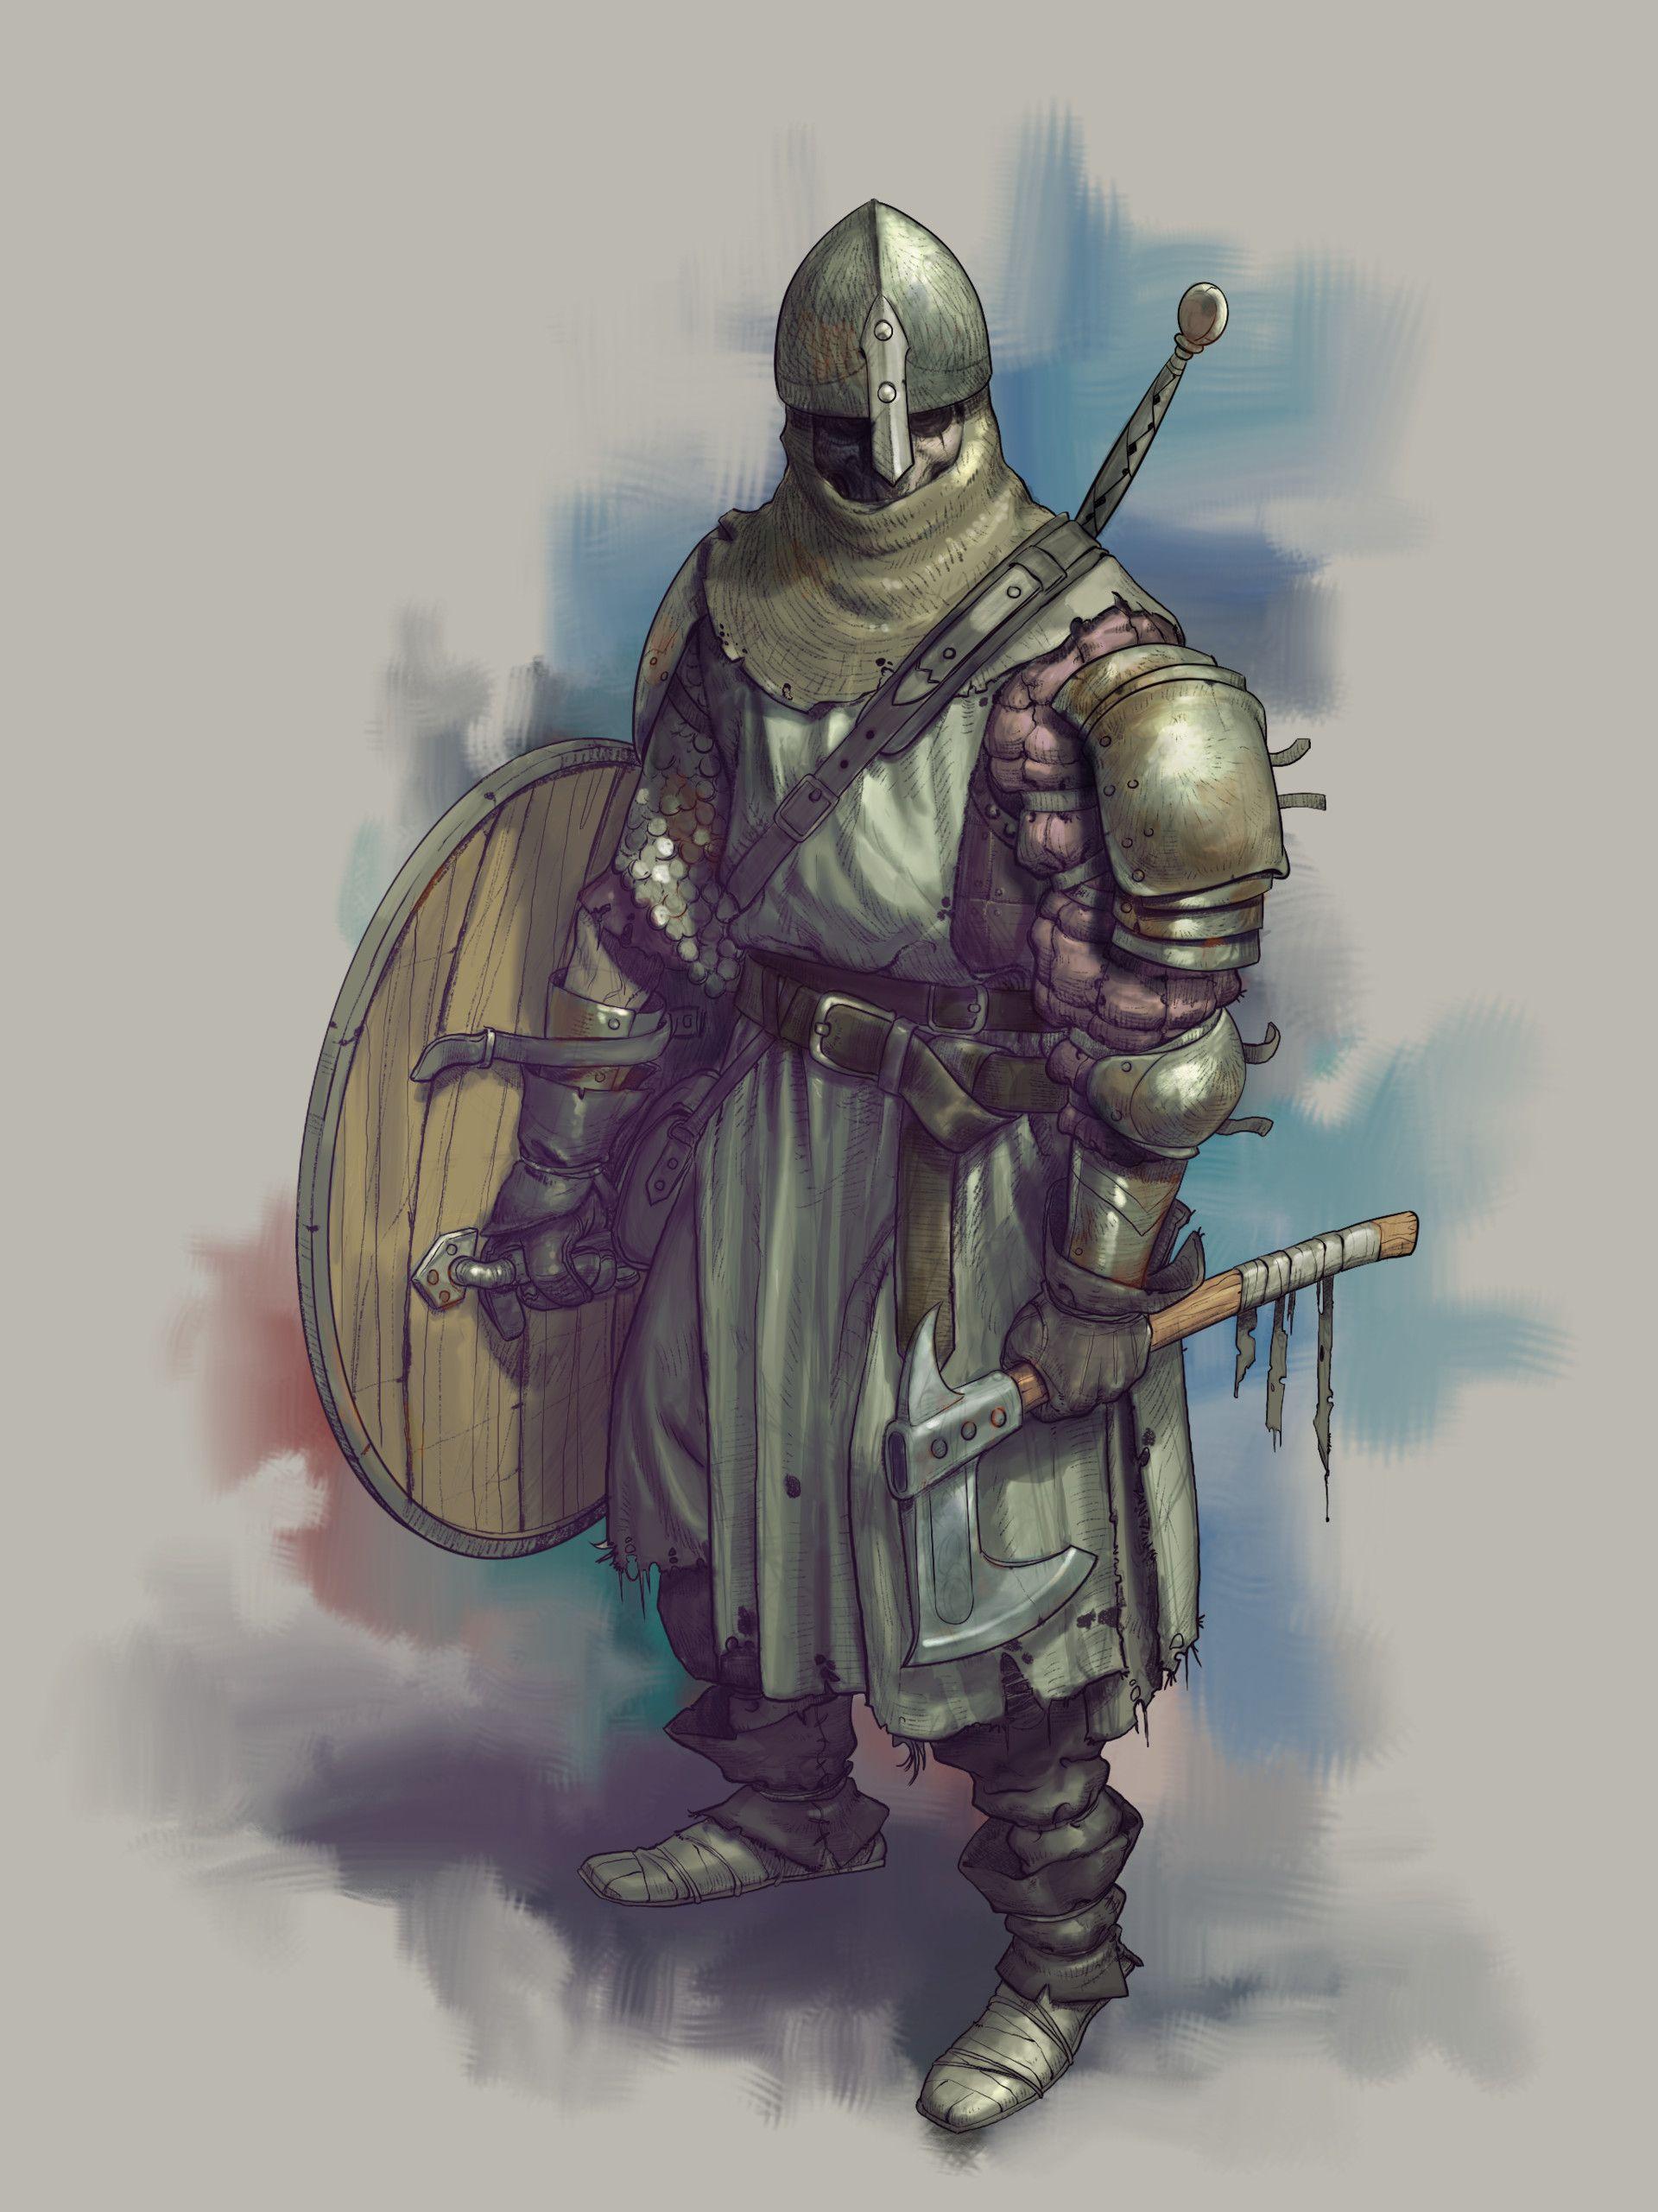 ArtStation Fantasy characters Mauro Fanelli